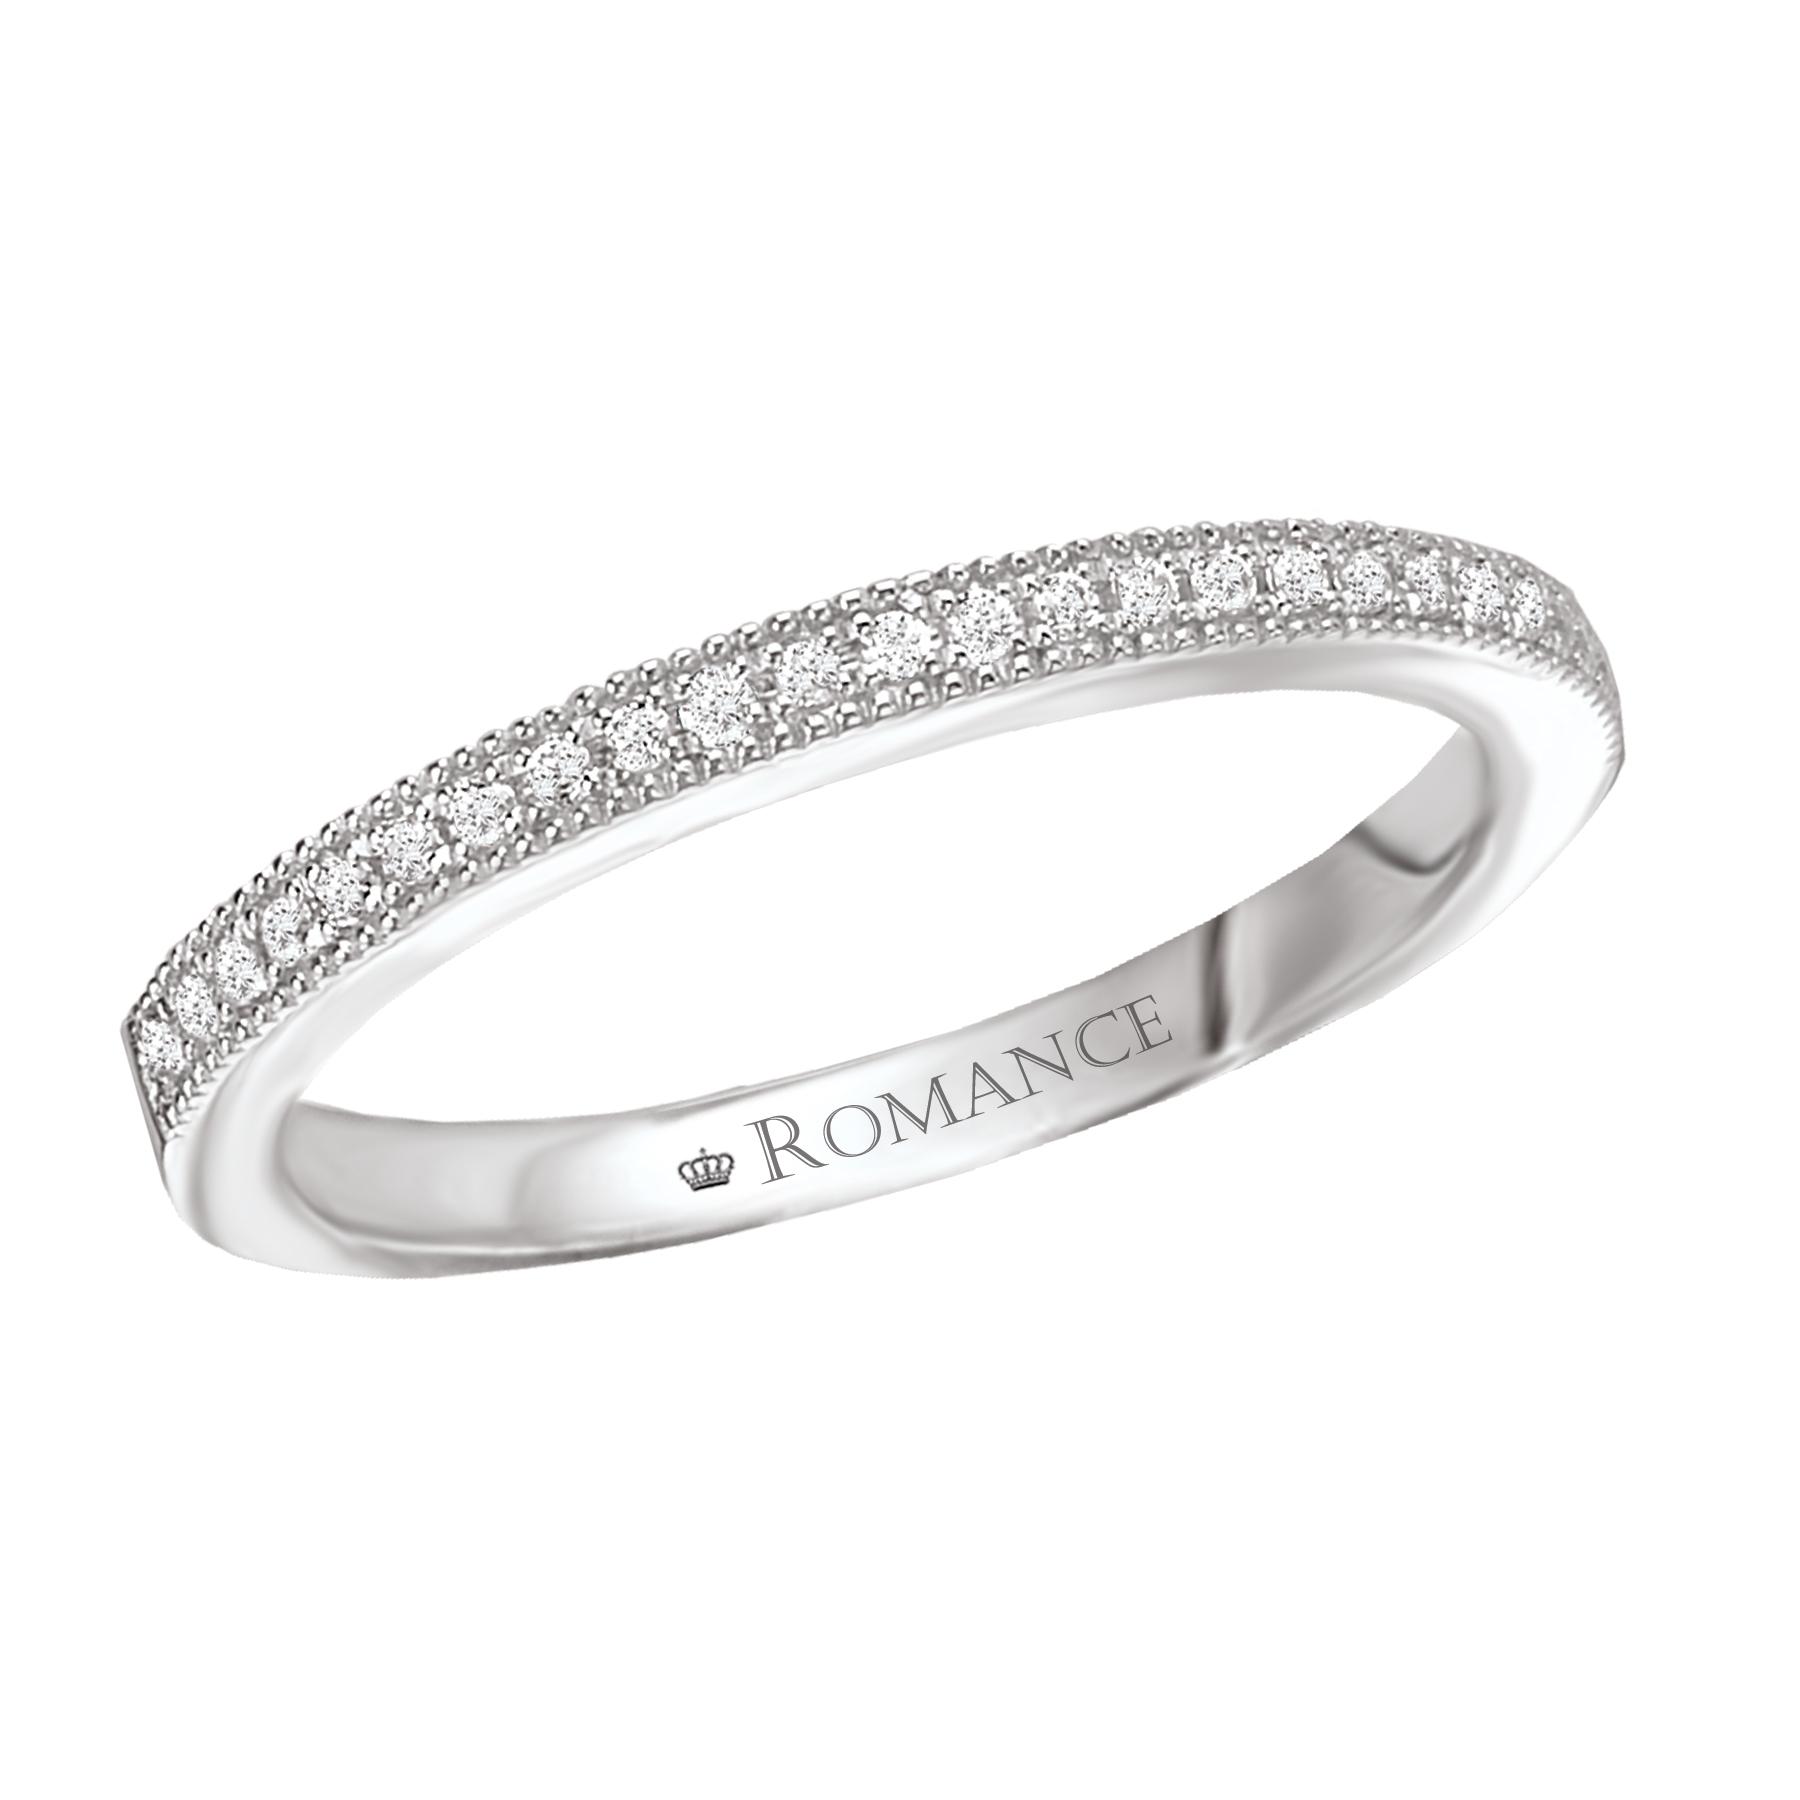 Romance Wedding Bands 118183-W product image